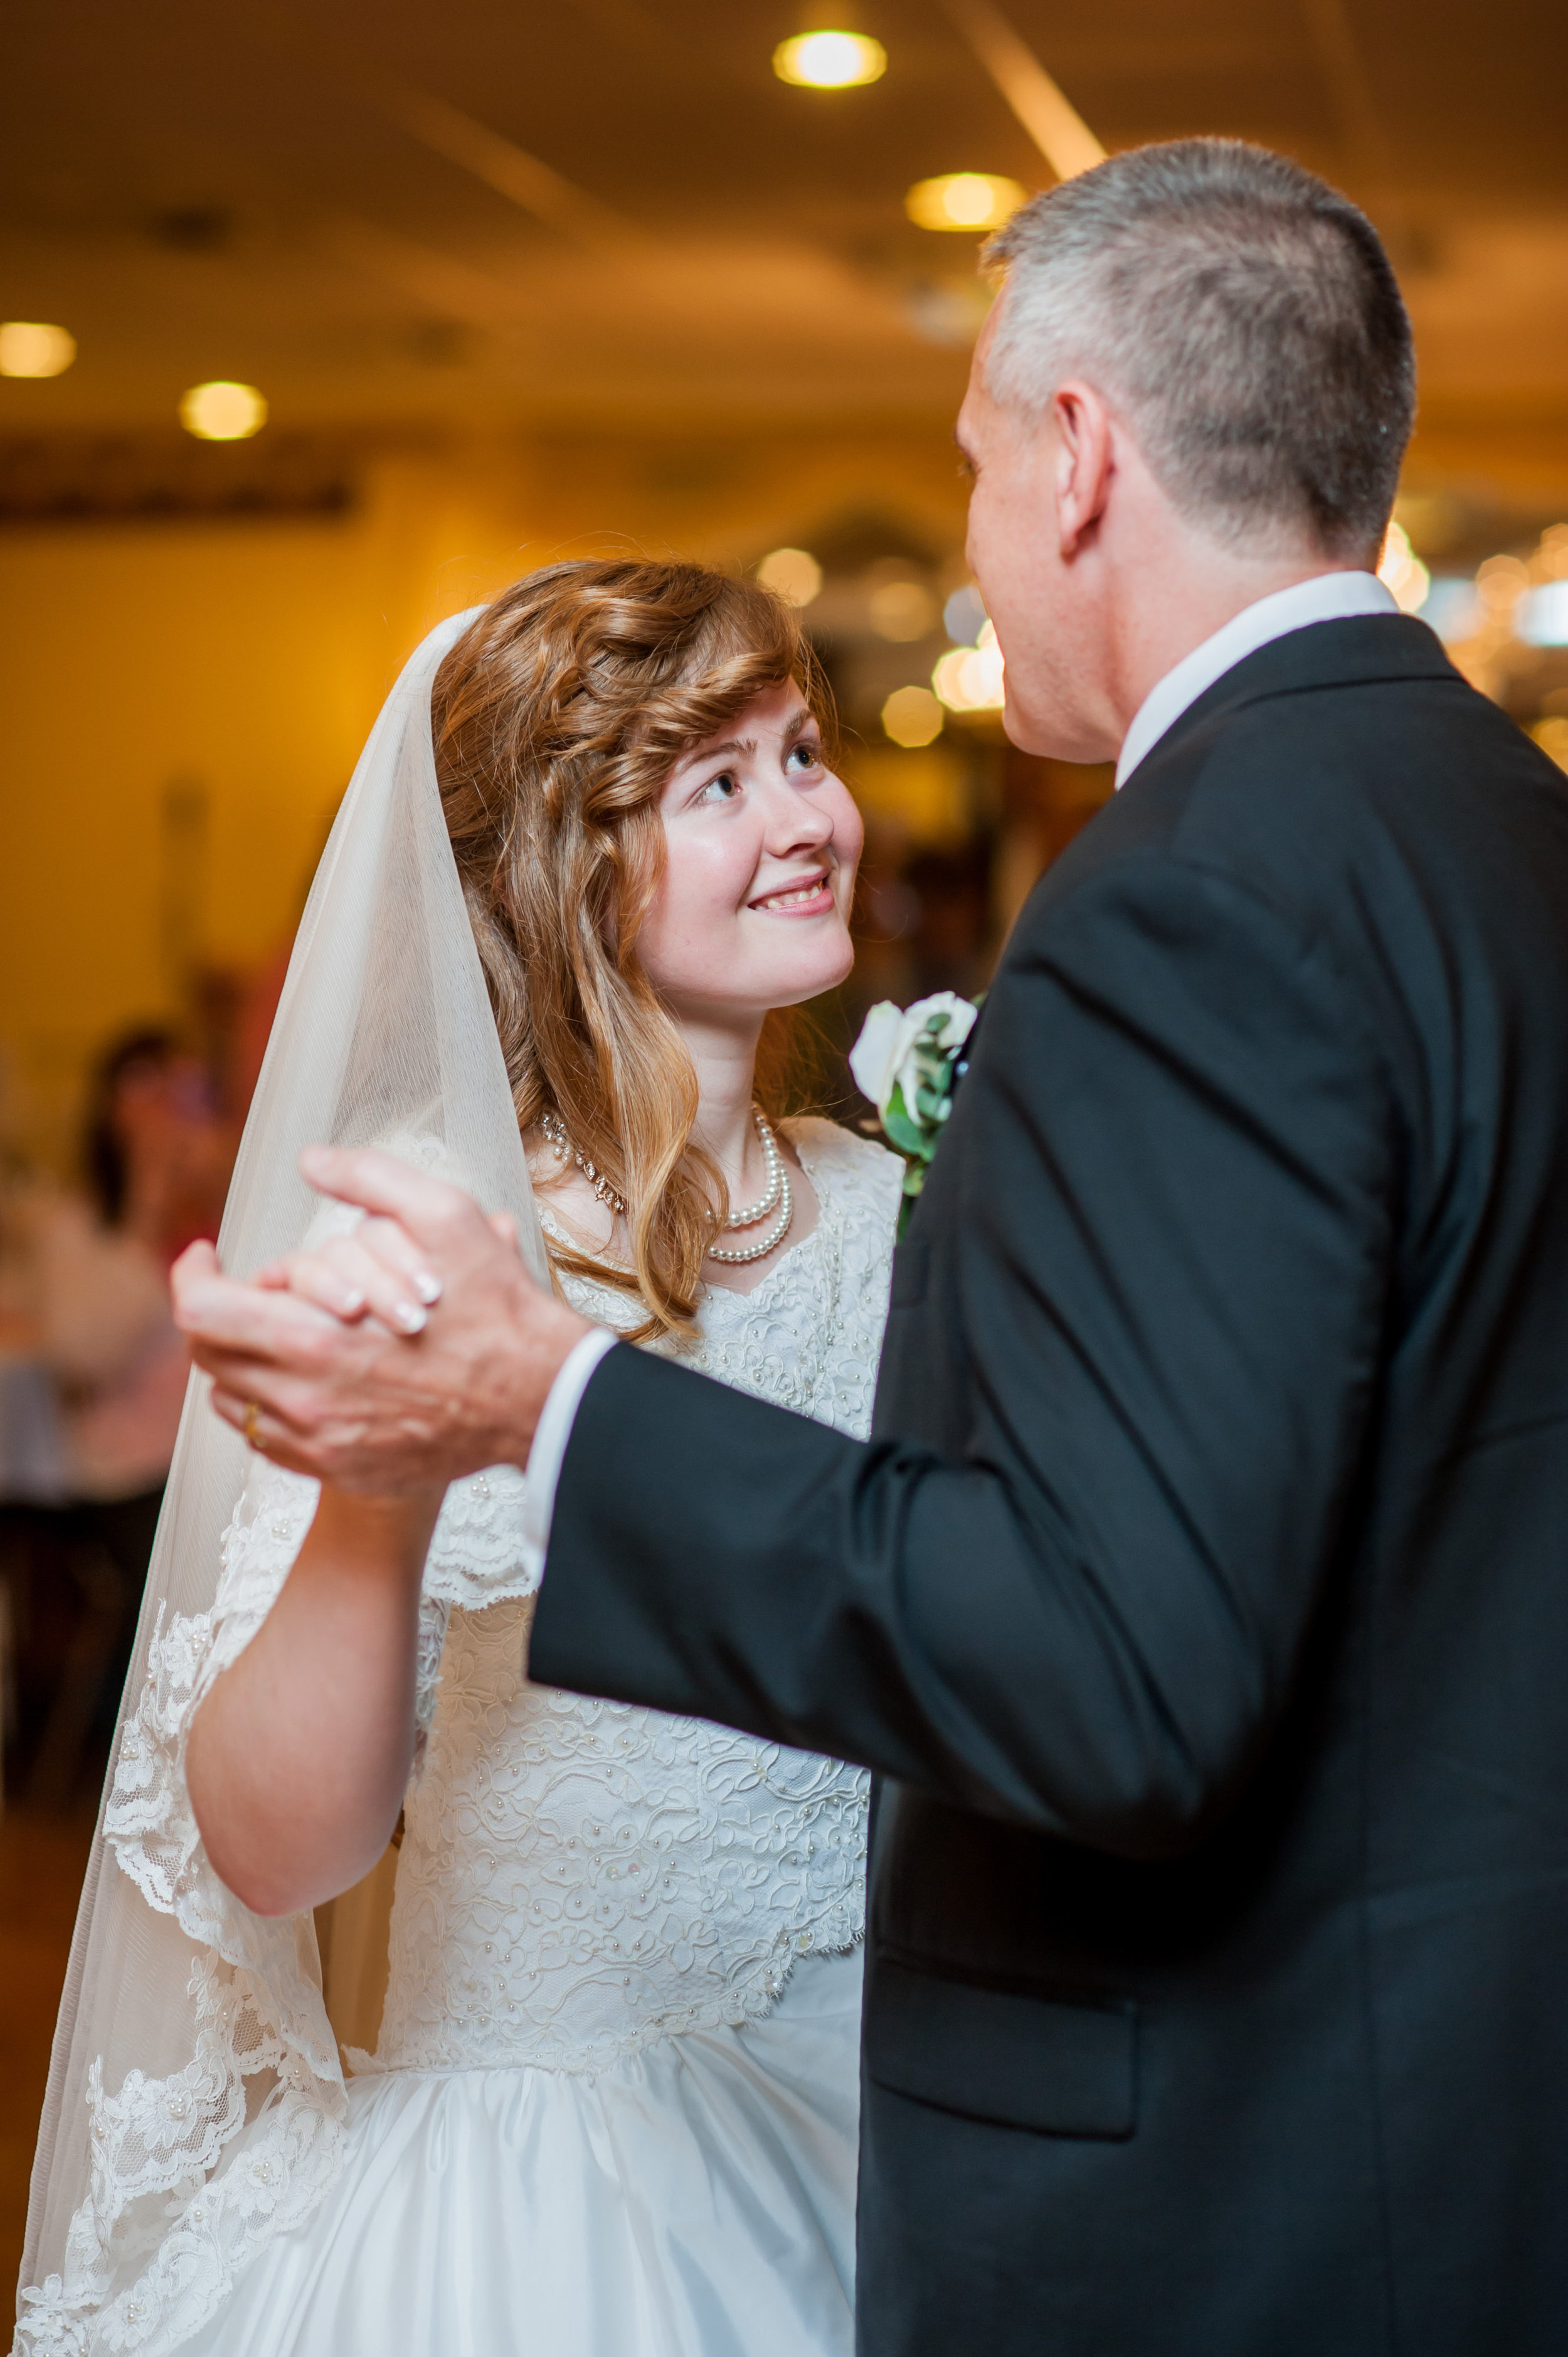 Christine Joseph-Christine Auxier 05 23 2015 Wedding Done Jarrett 2-0056.jpg